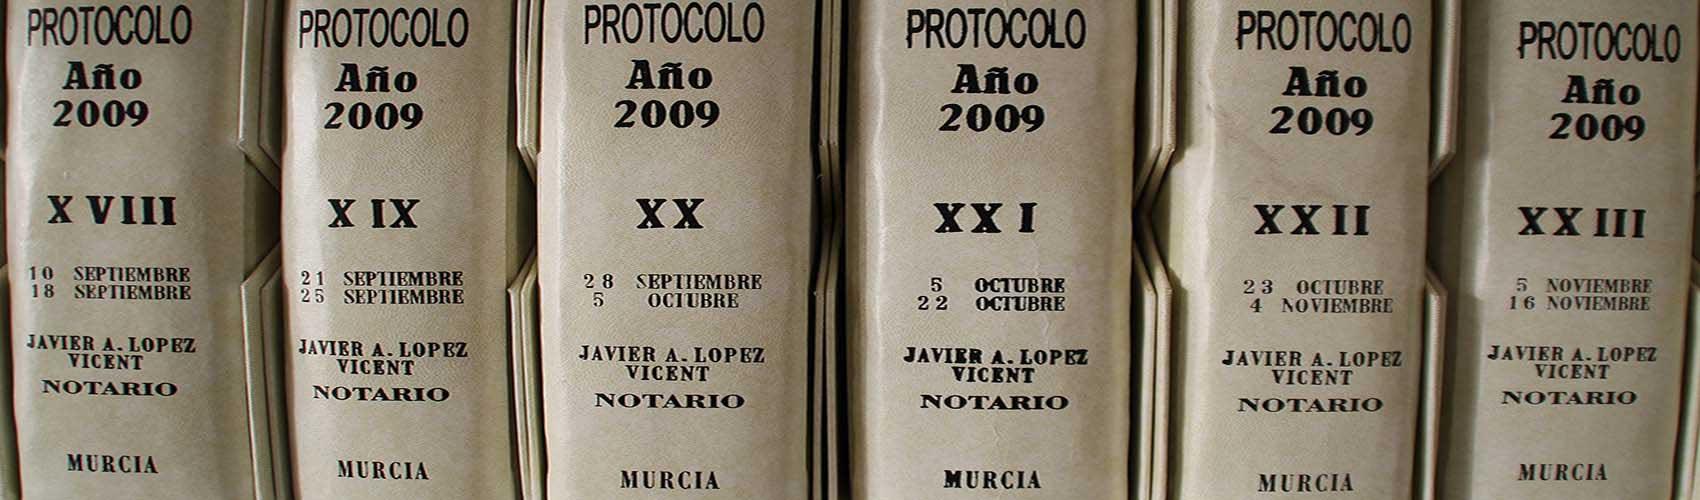 Javier-Alfonso-López-Vicent-Villaleal-protocolo-escritura-notaría-murcia-notario-centro-capital-cerca-plateria-traperia-slide